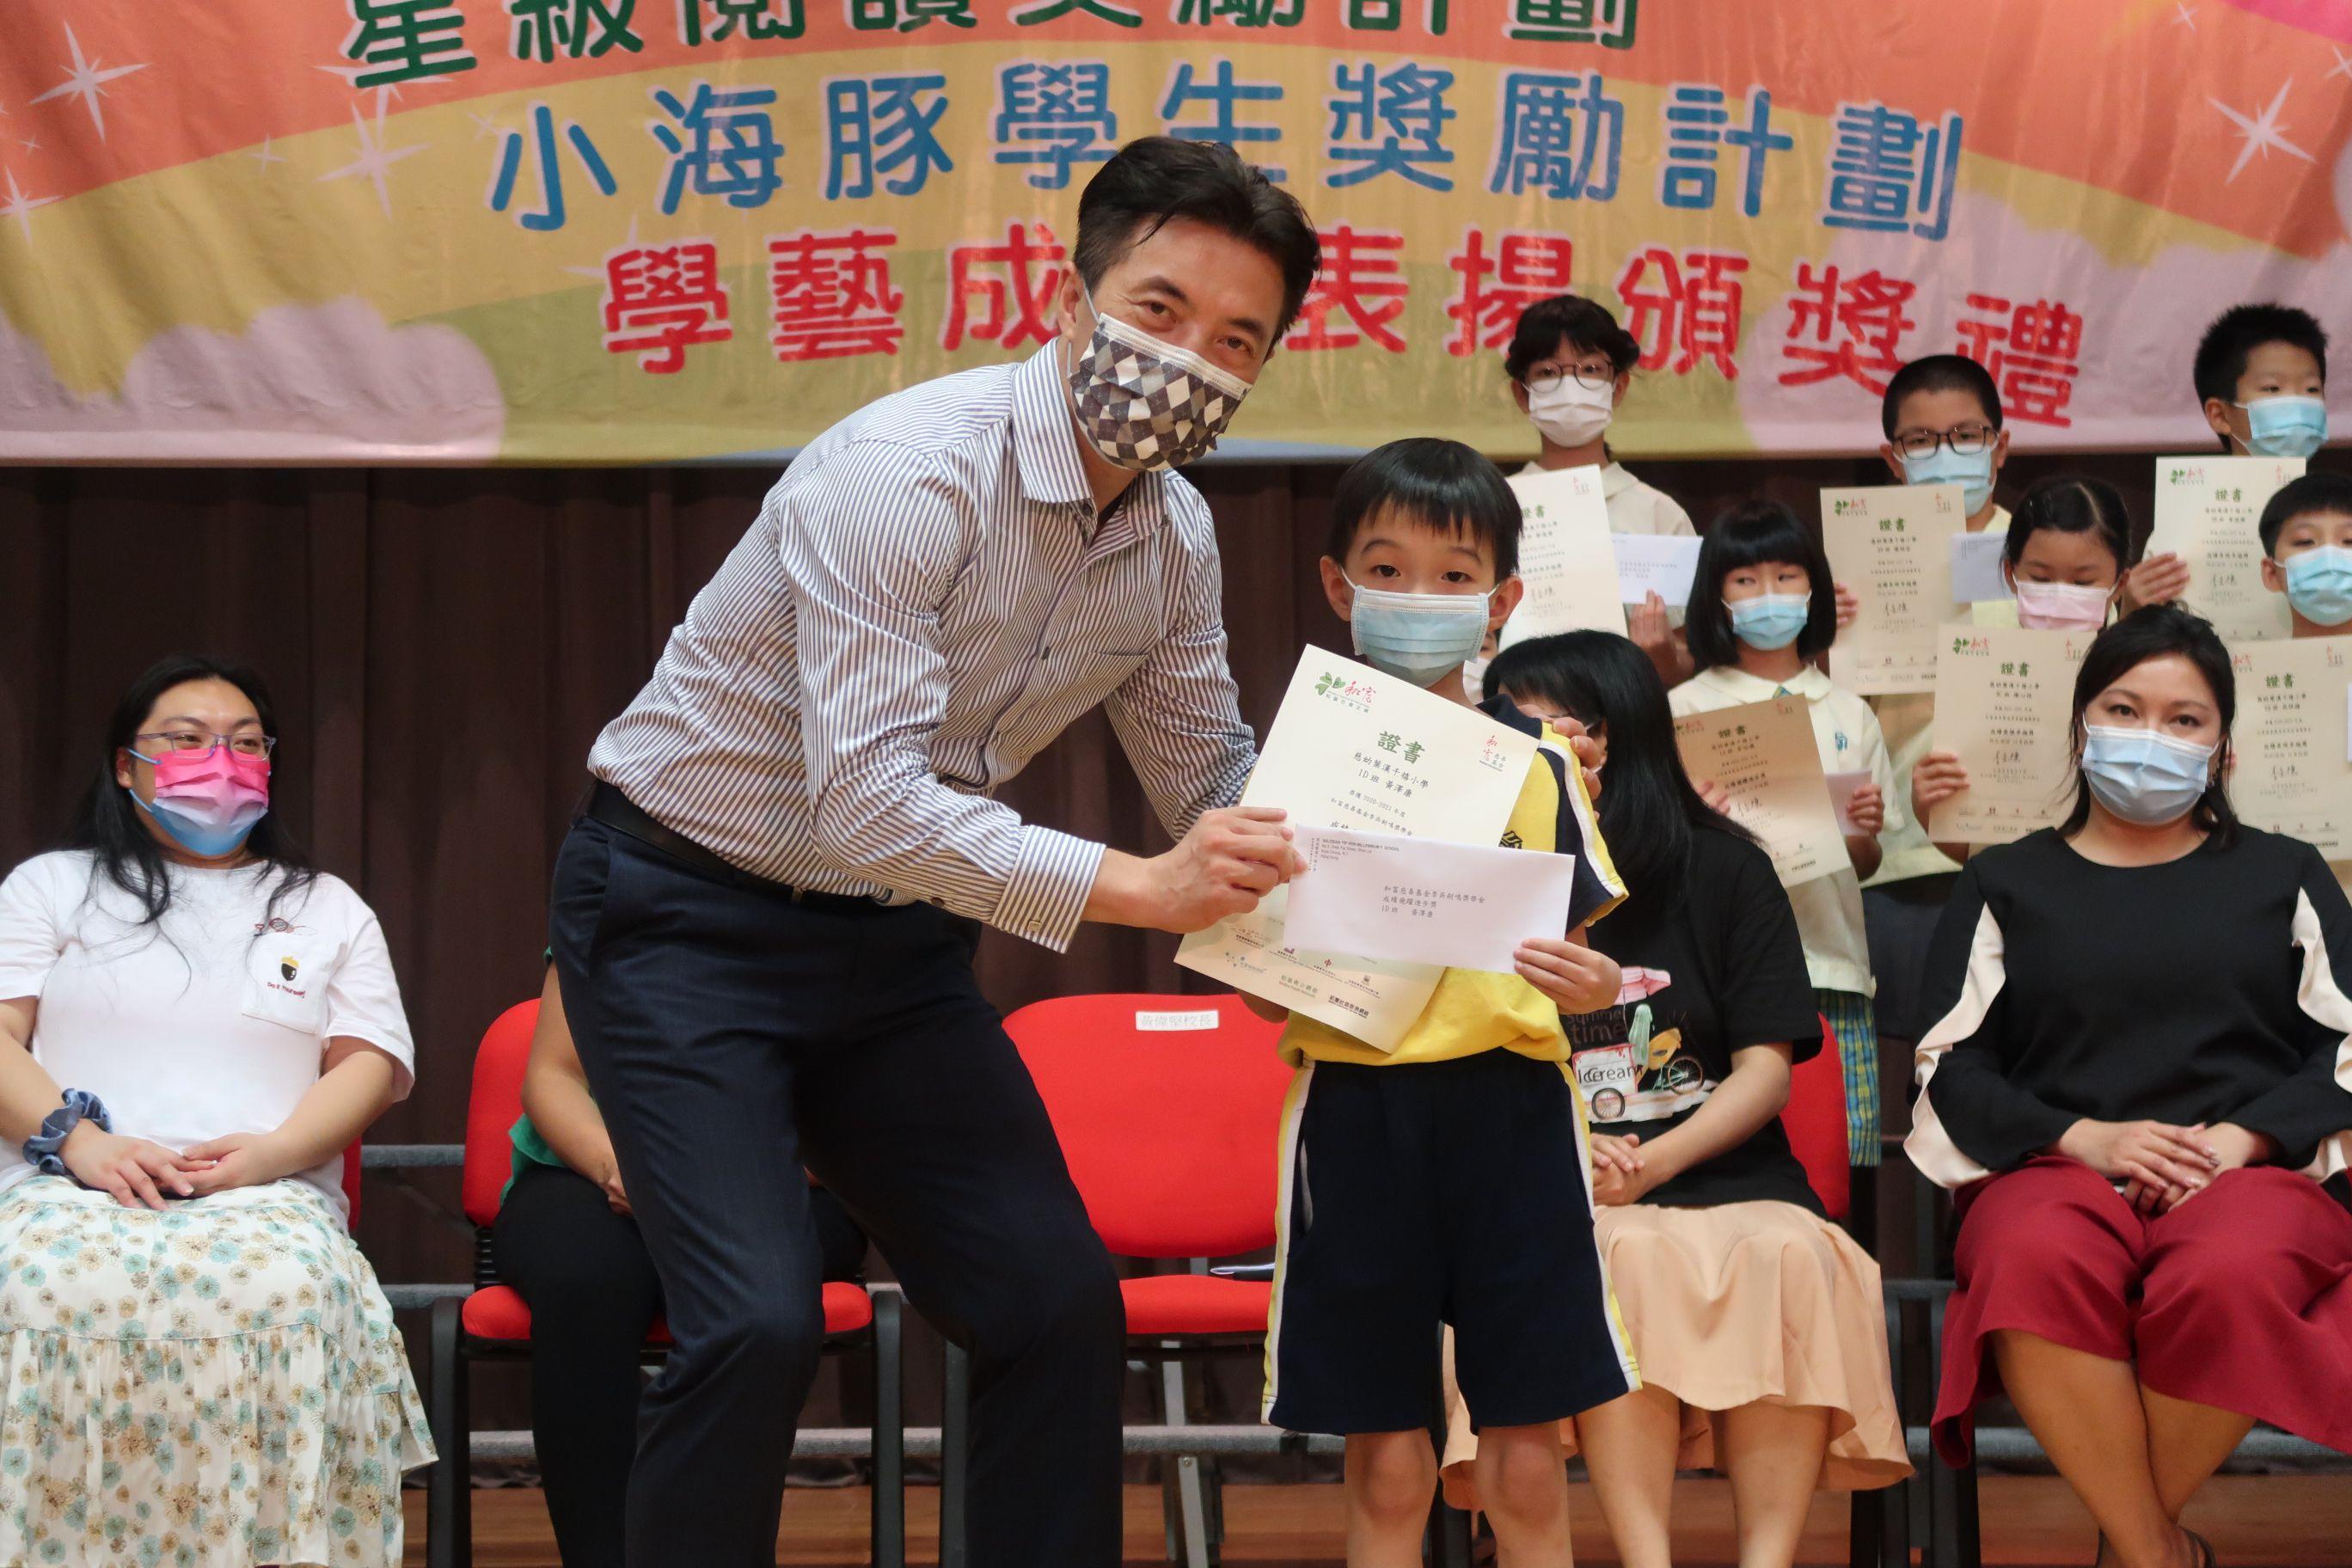 https://syh.edu.hk/sites/default/files/img_5938.jpg